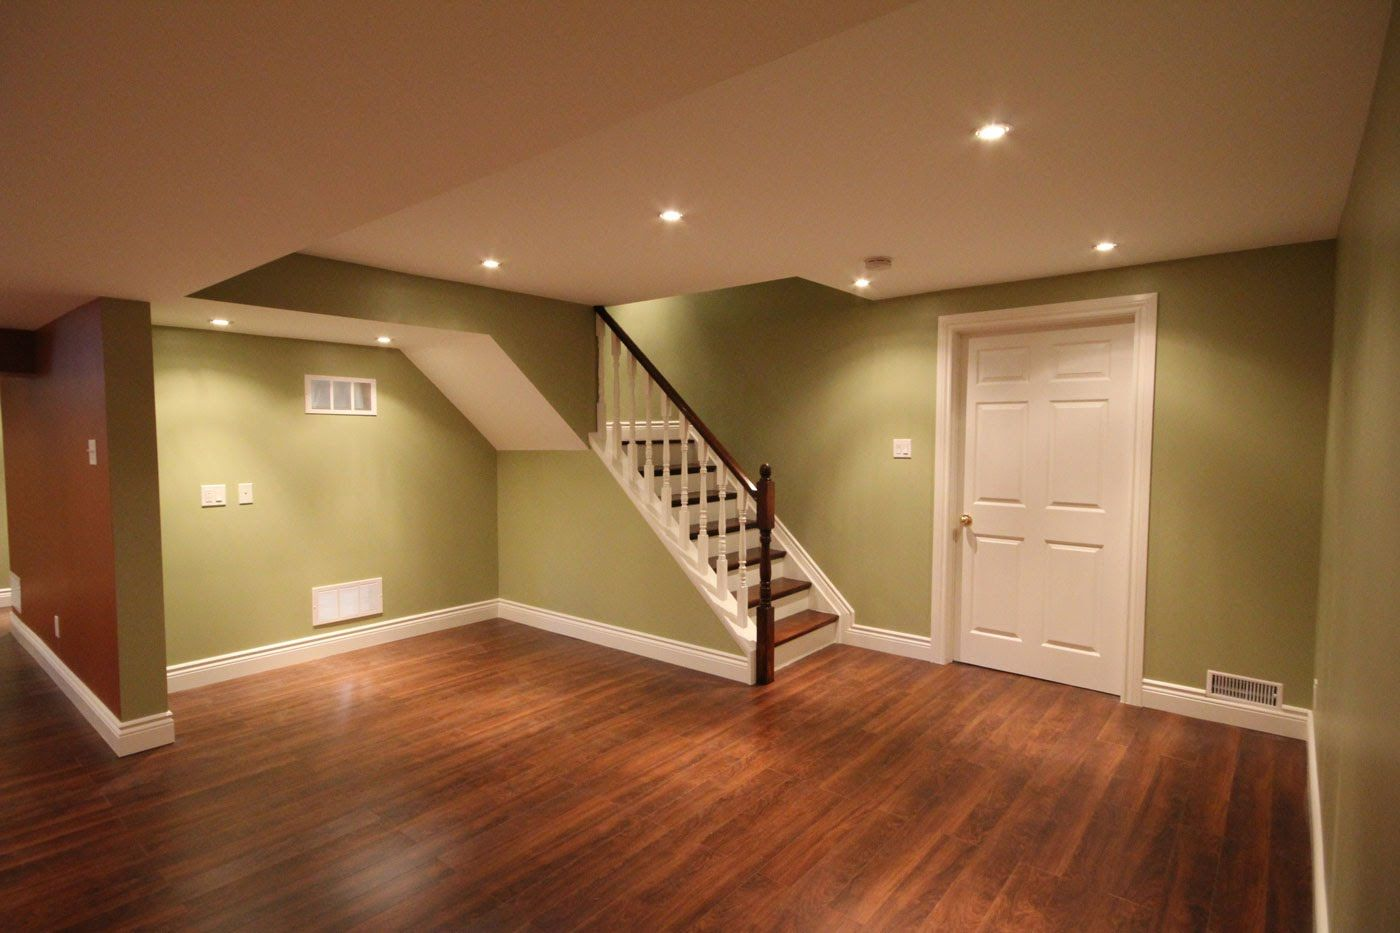 stair handrail height Google Search Basement